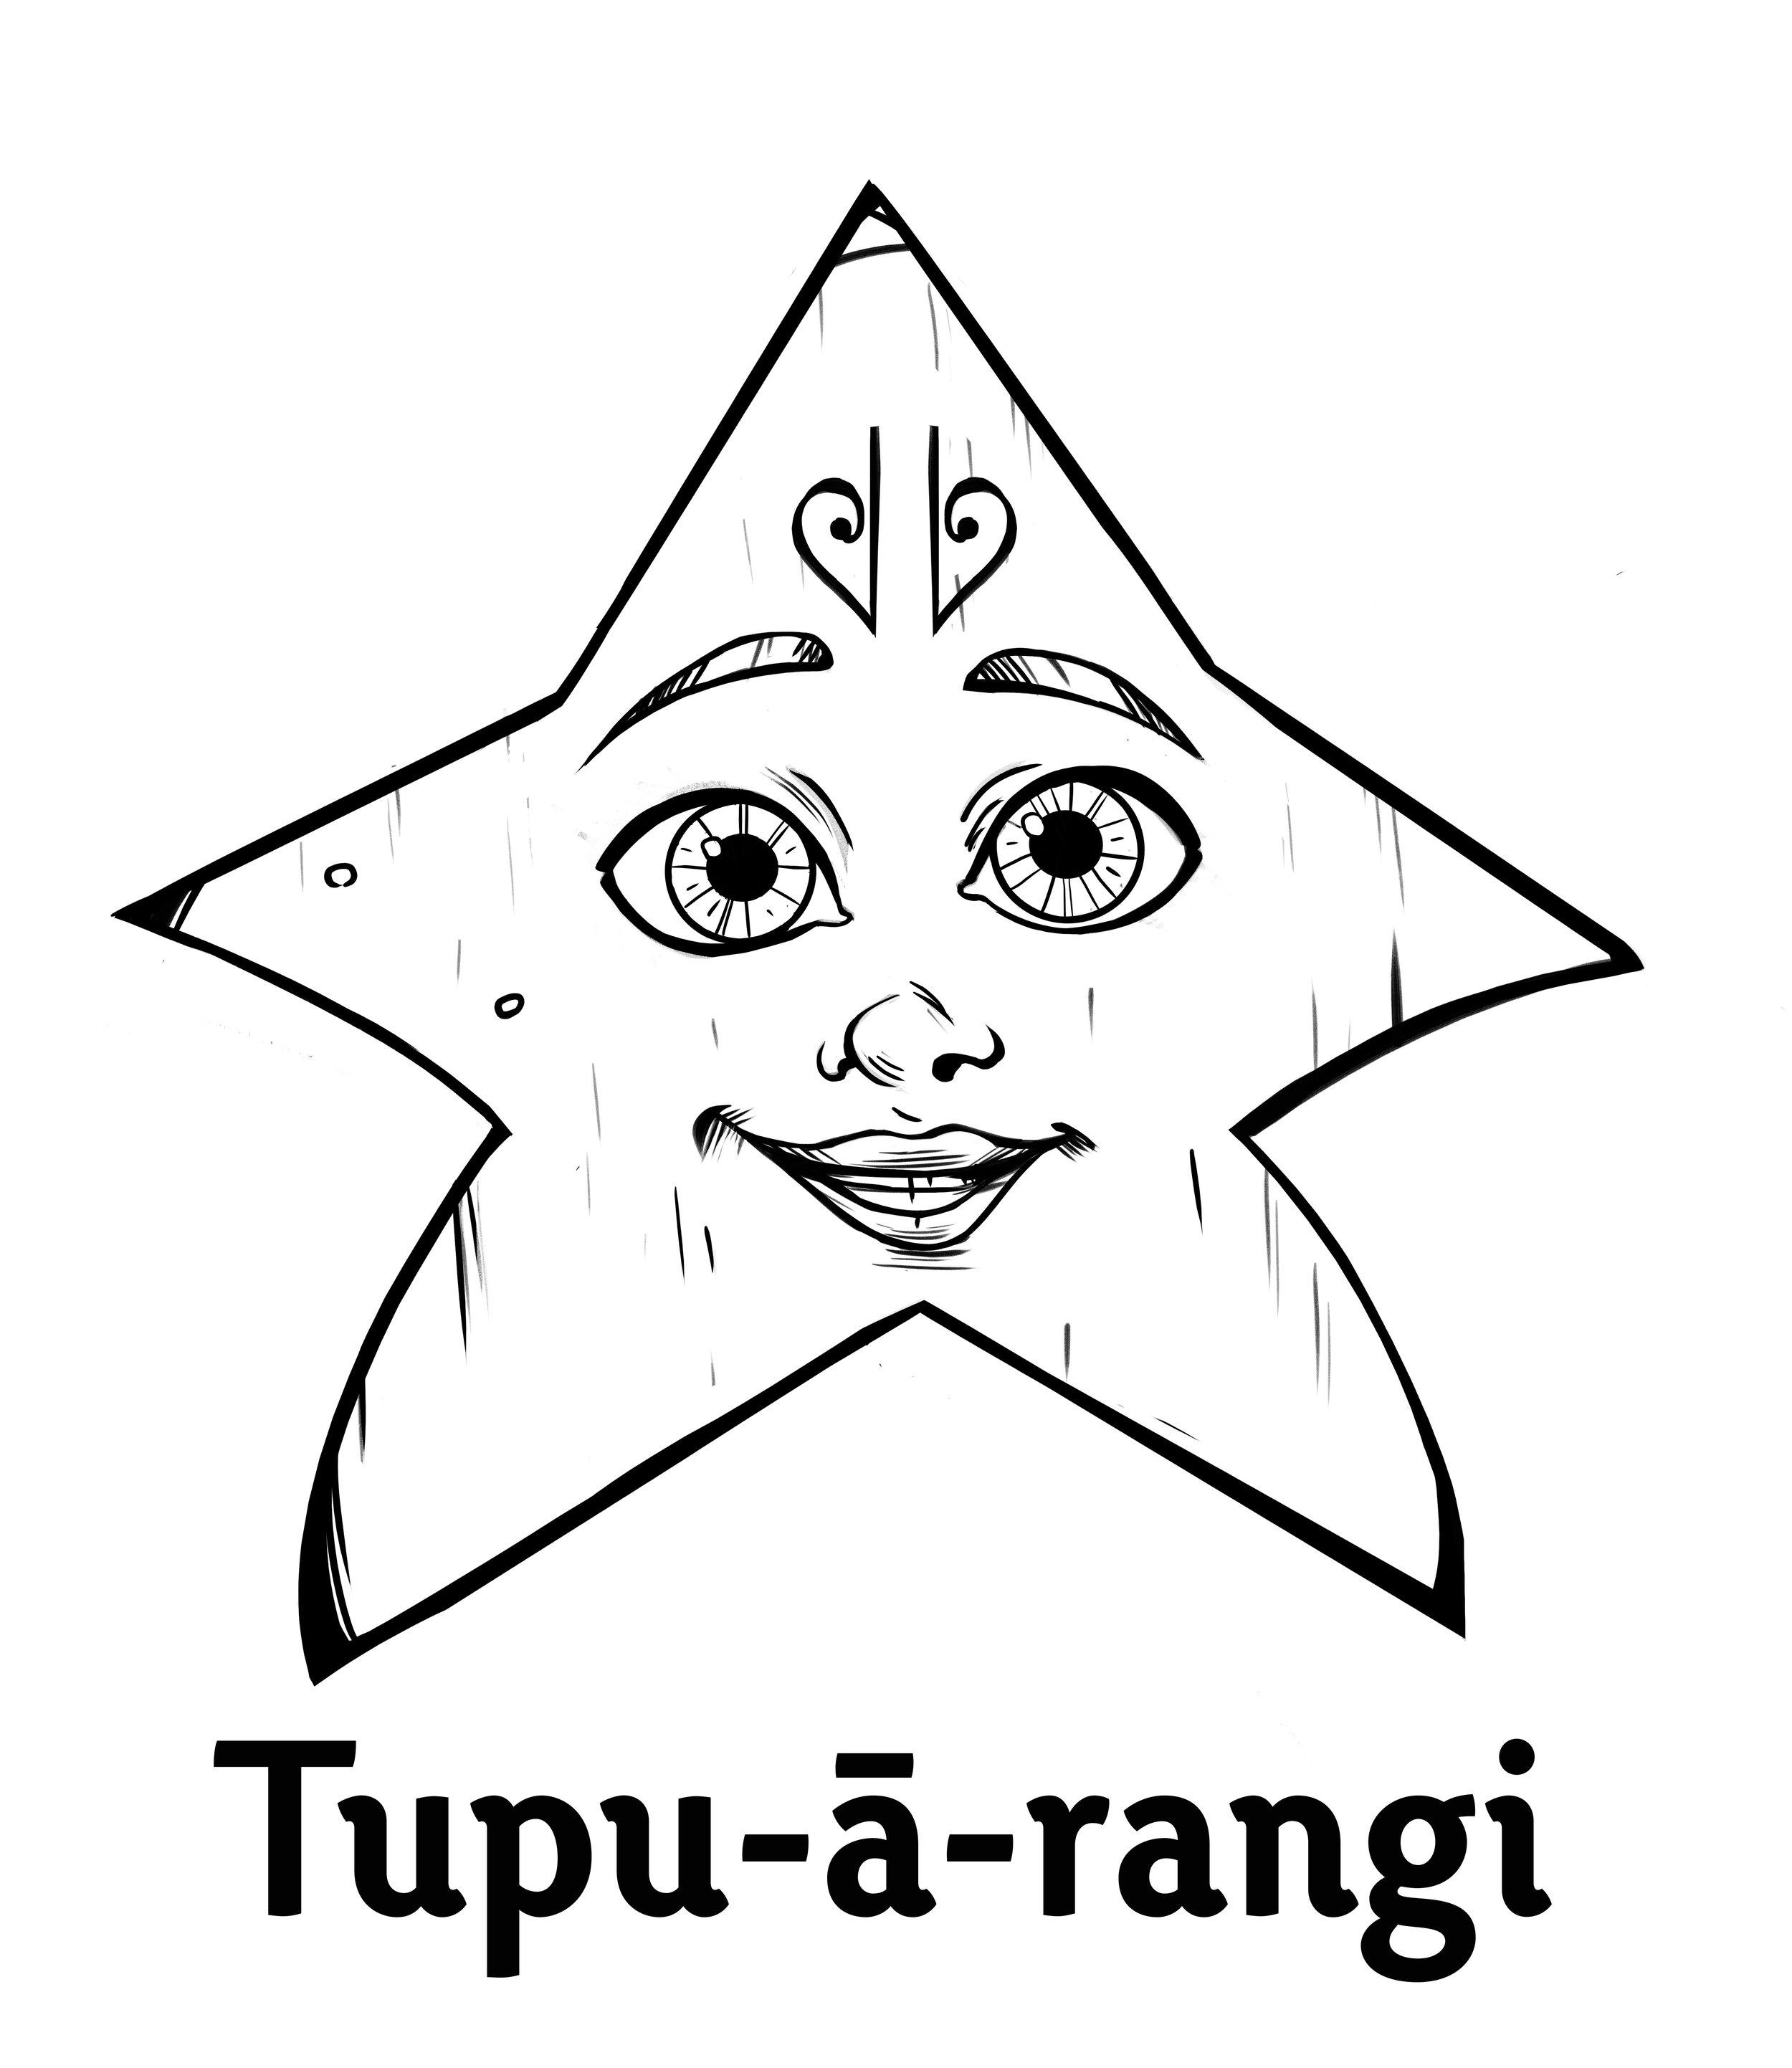 Tupu-ā-rangi